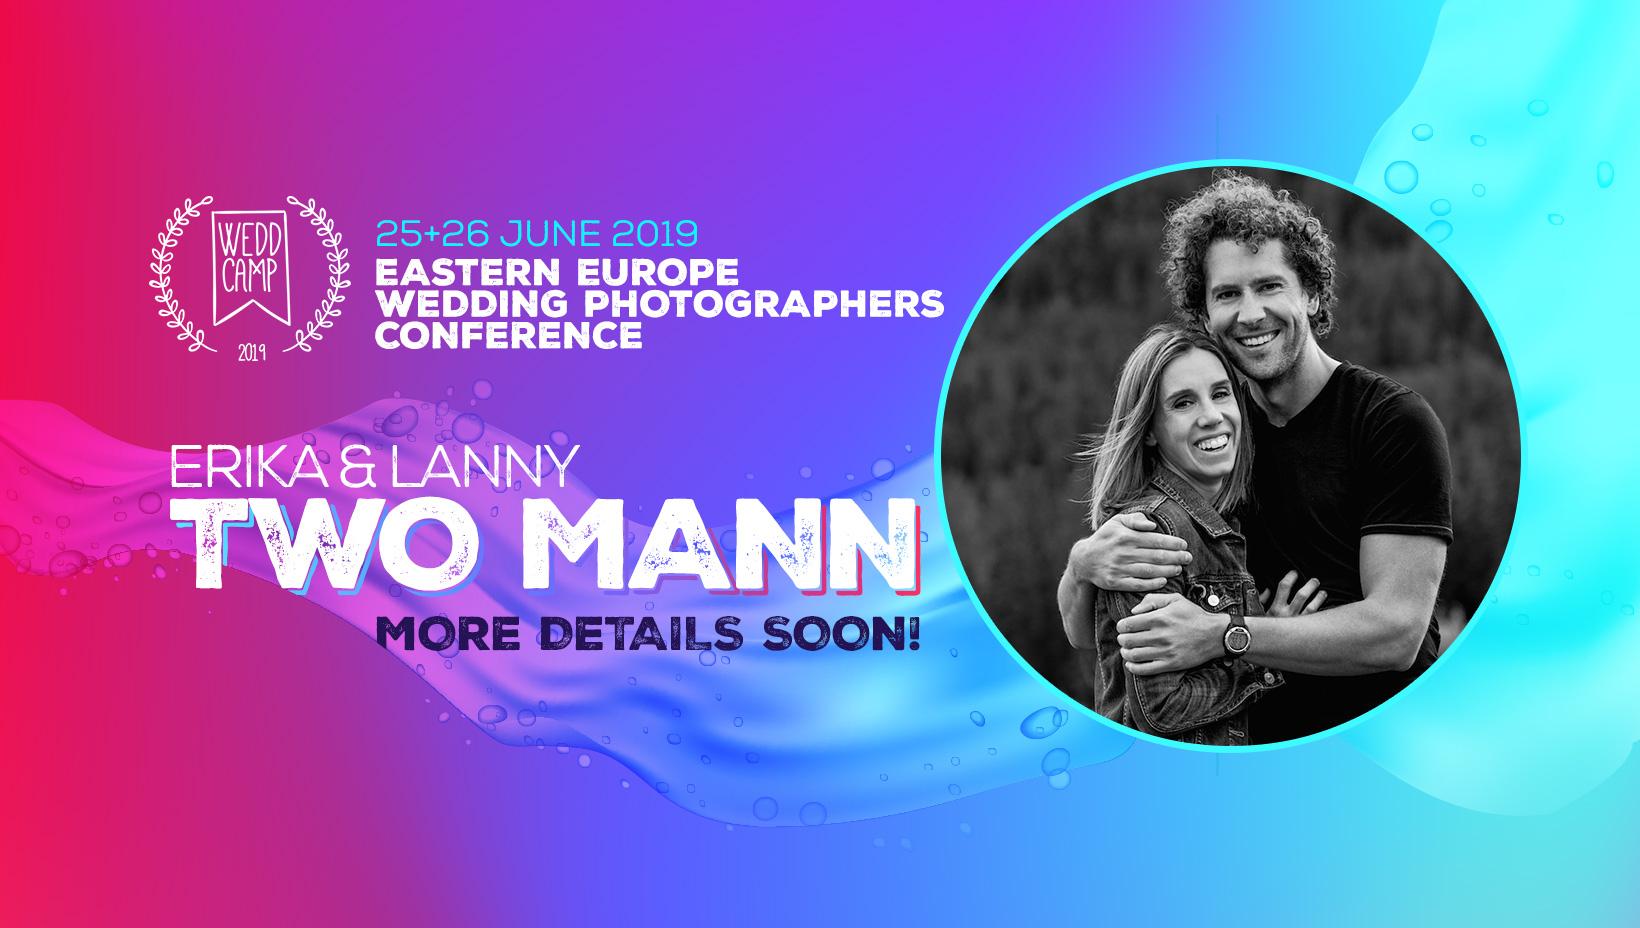 Two Mann speakeri la conferinta fotografilor de nunta WEDDCAMP 2019